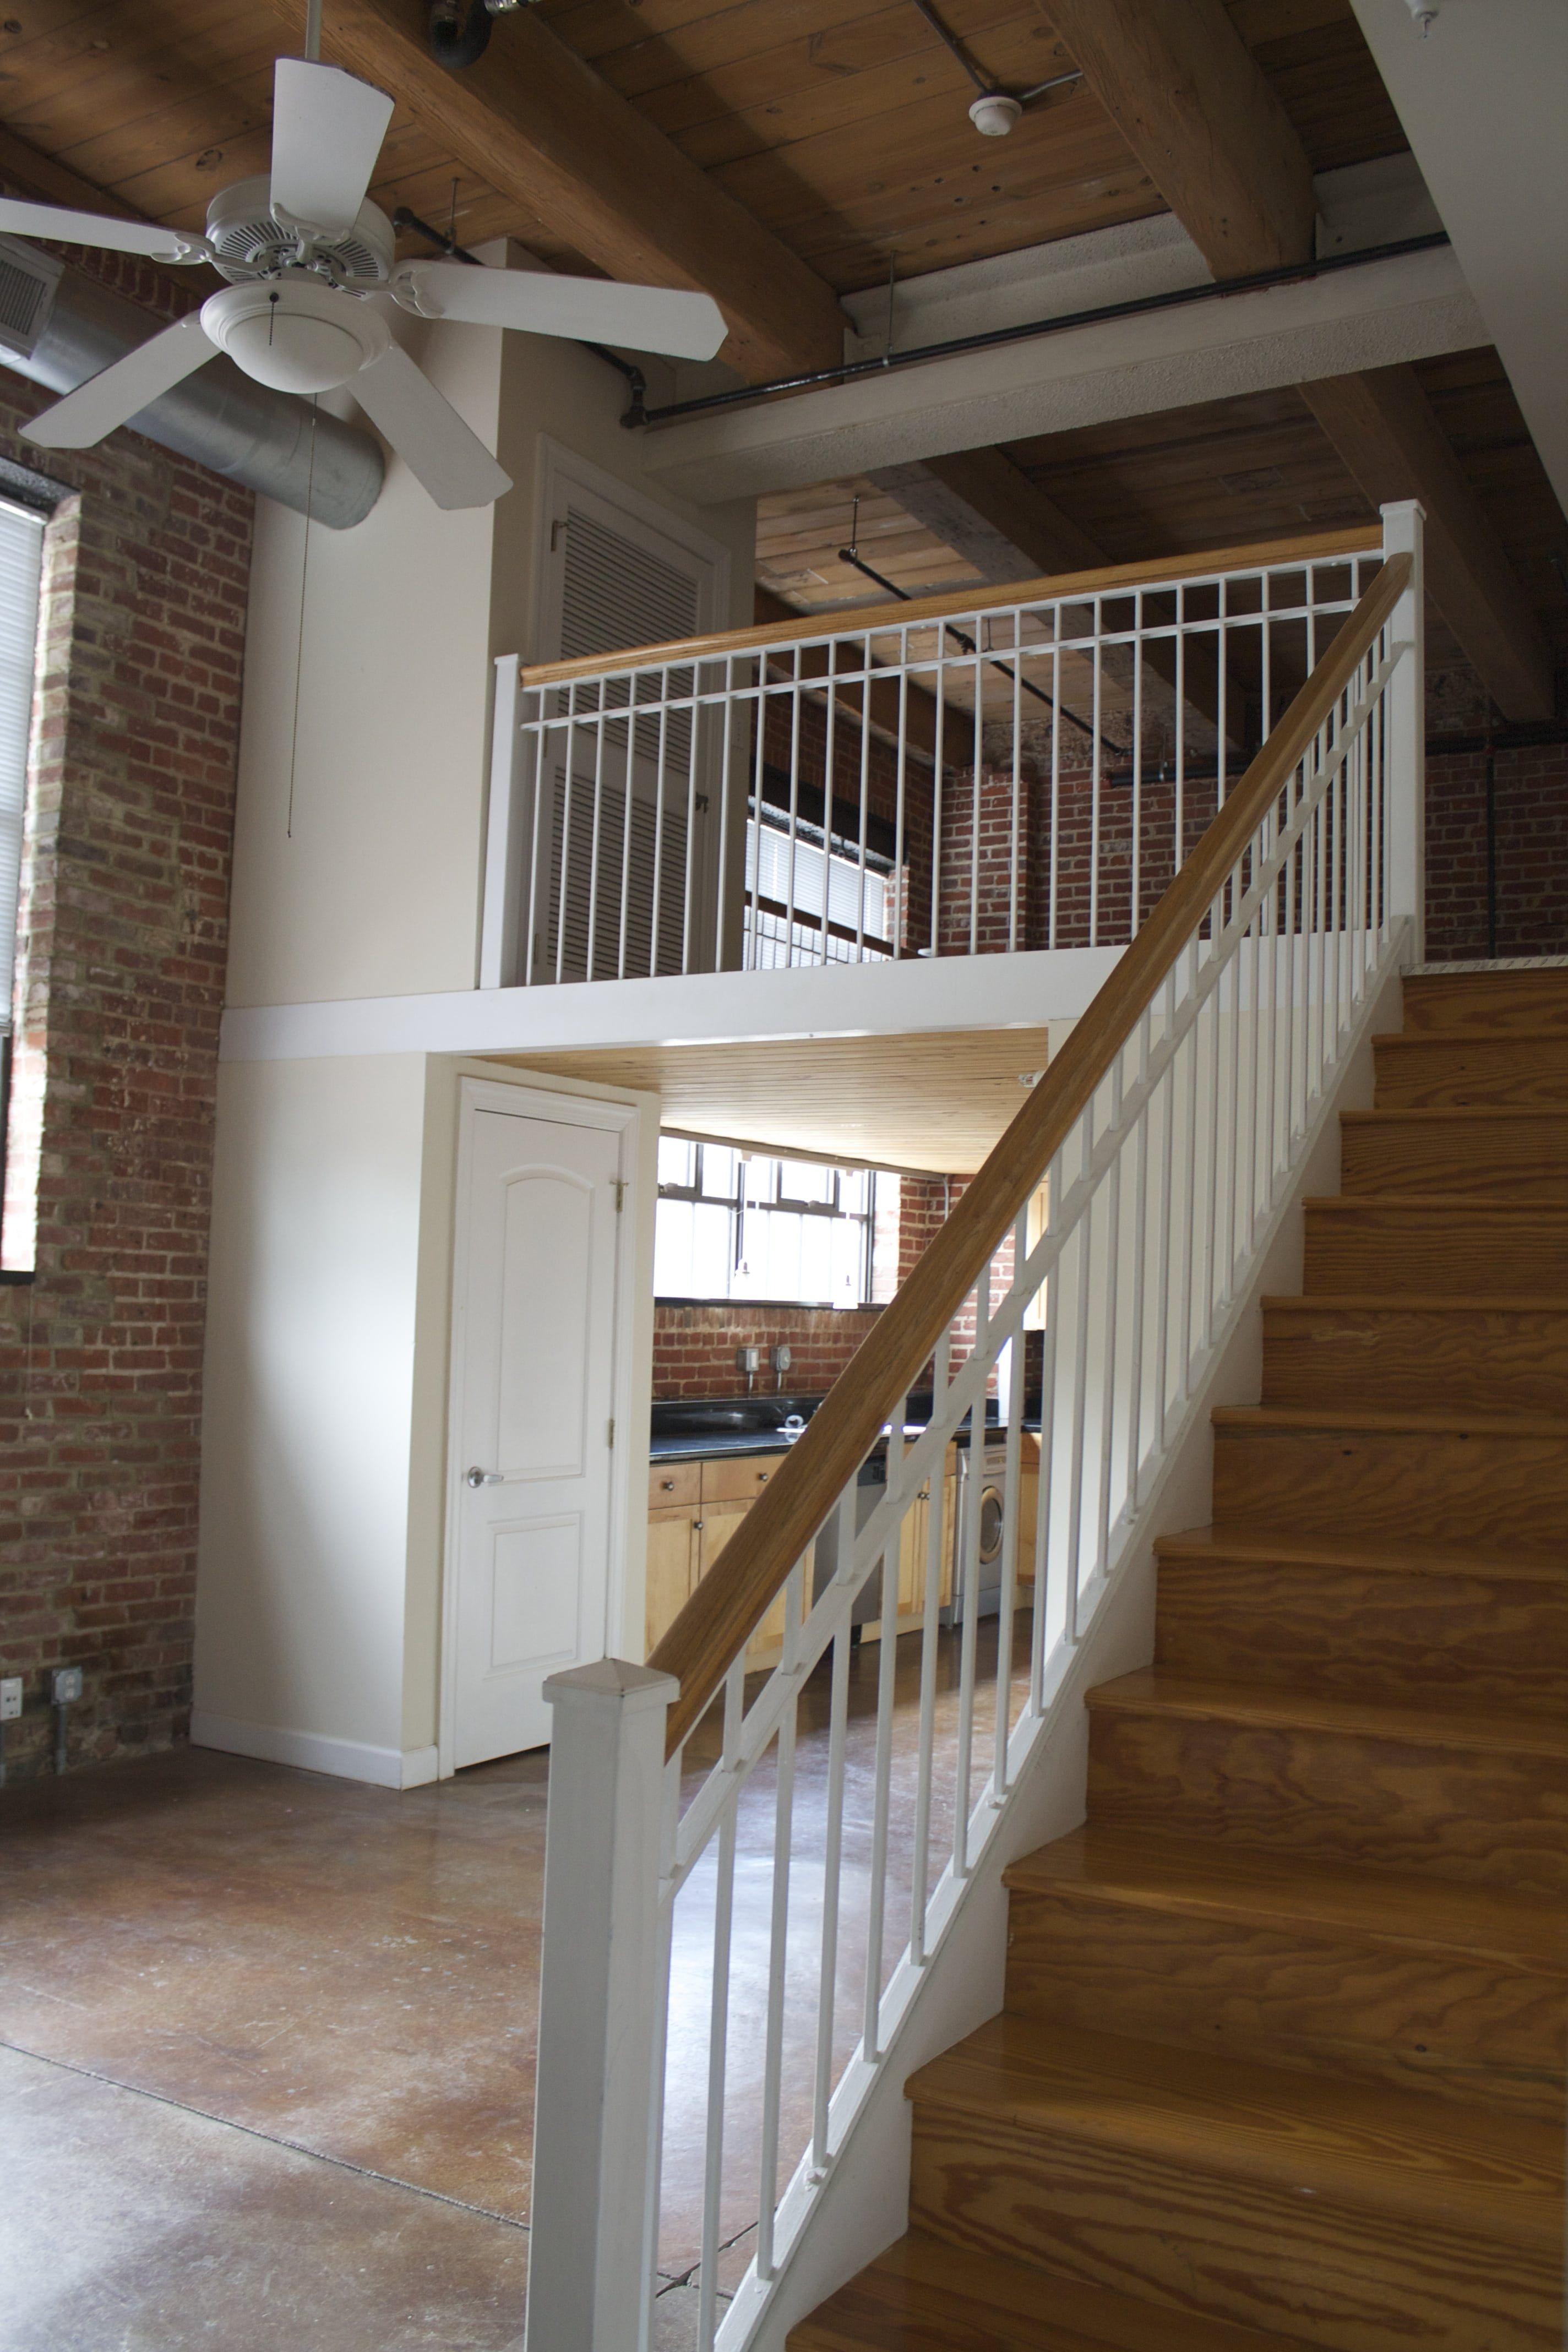 1 Bedroom Loft B Floor Plan 6 Floor plans, Flooring